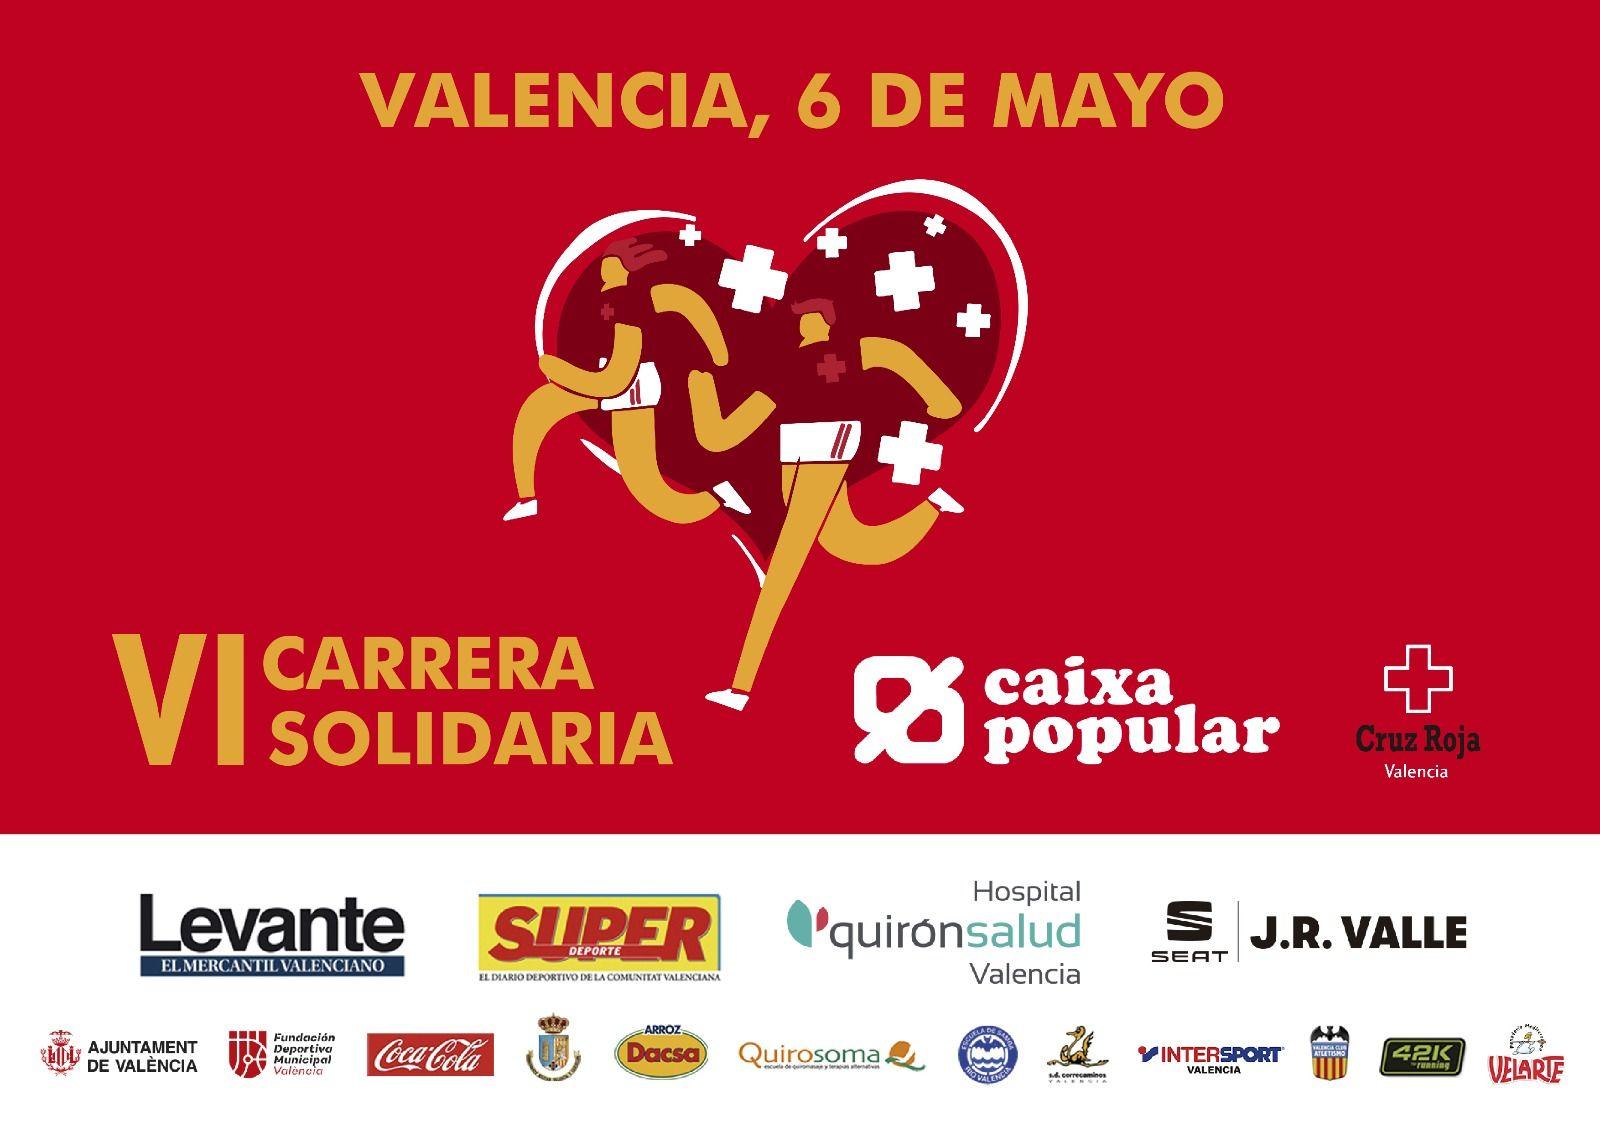 SEAT JR Valle patrocina la Carrera Solidaria de Cruz Roja